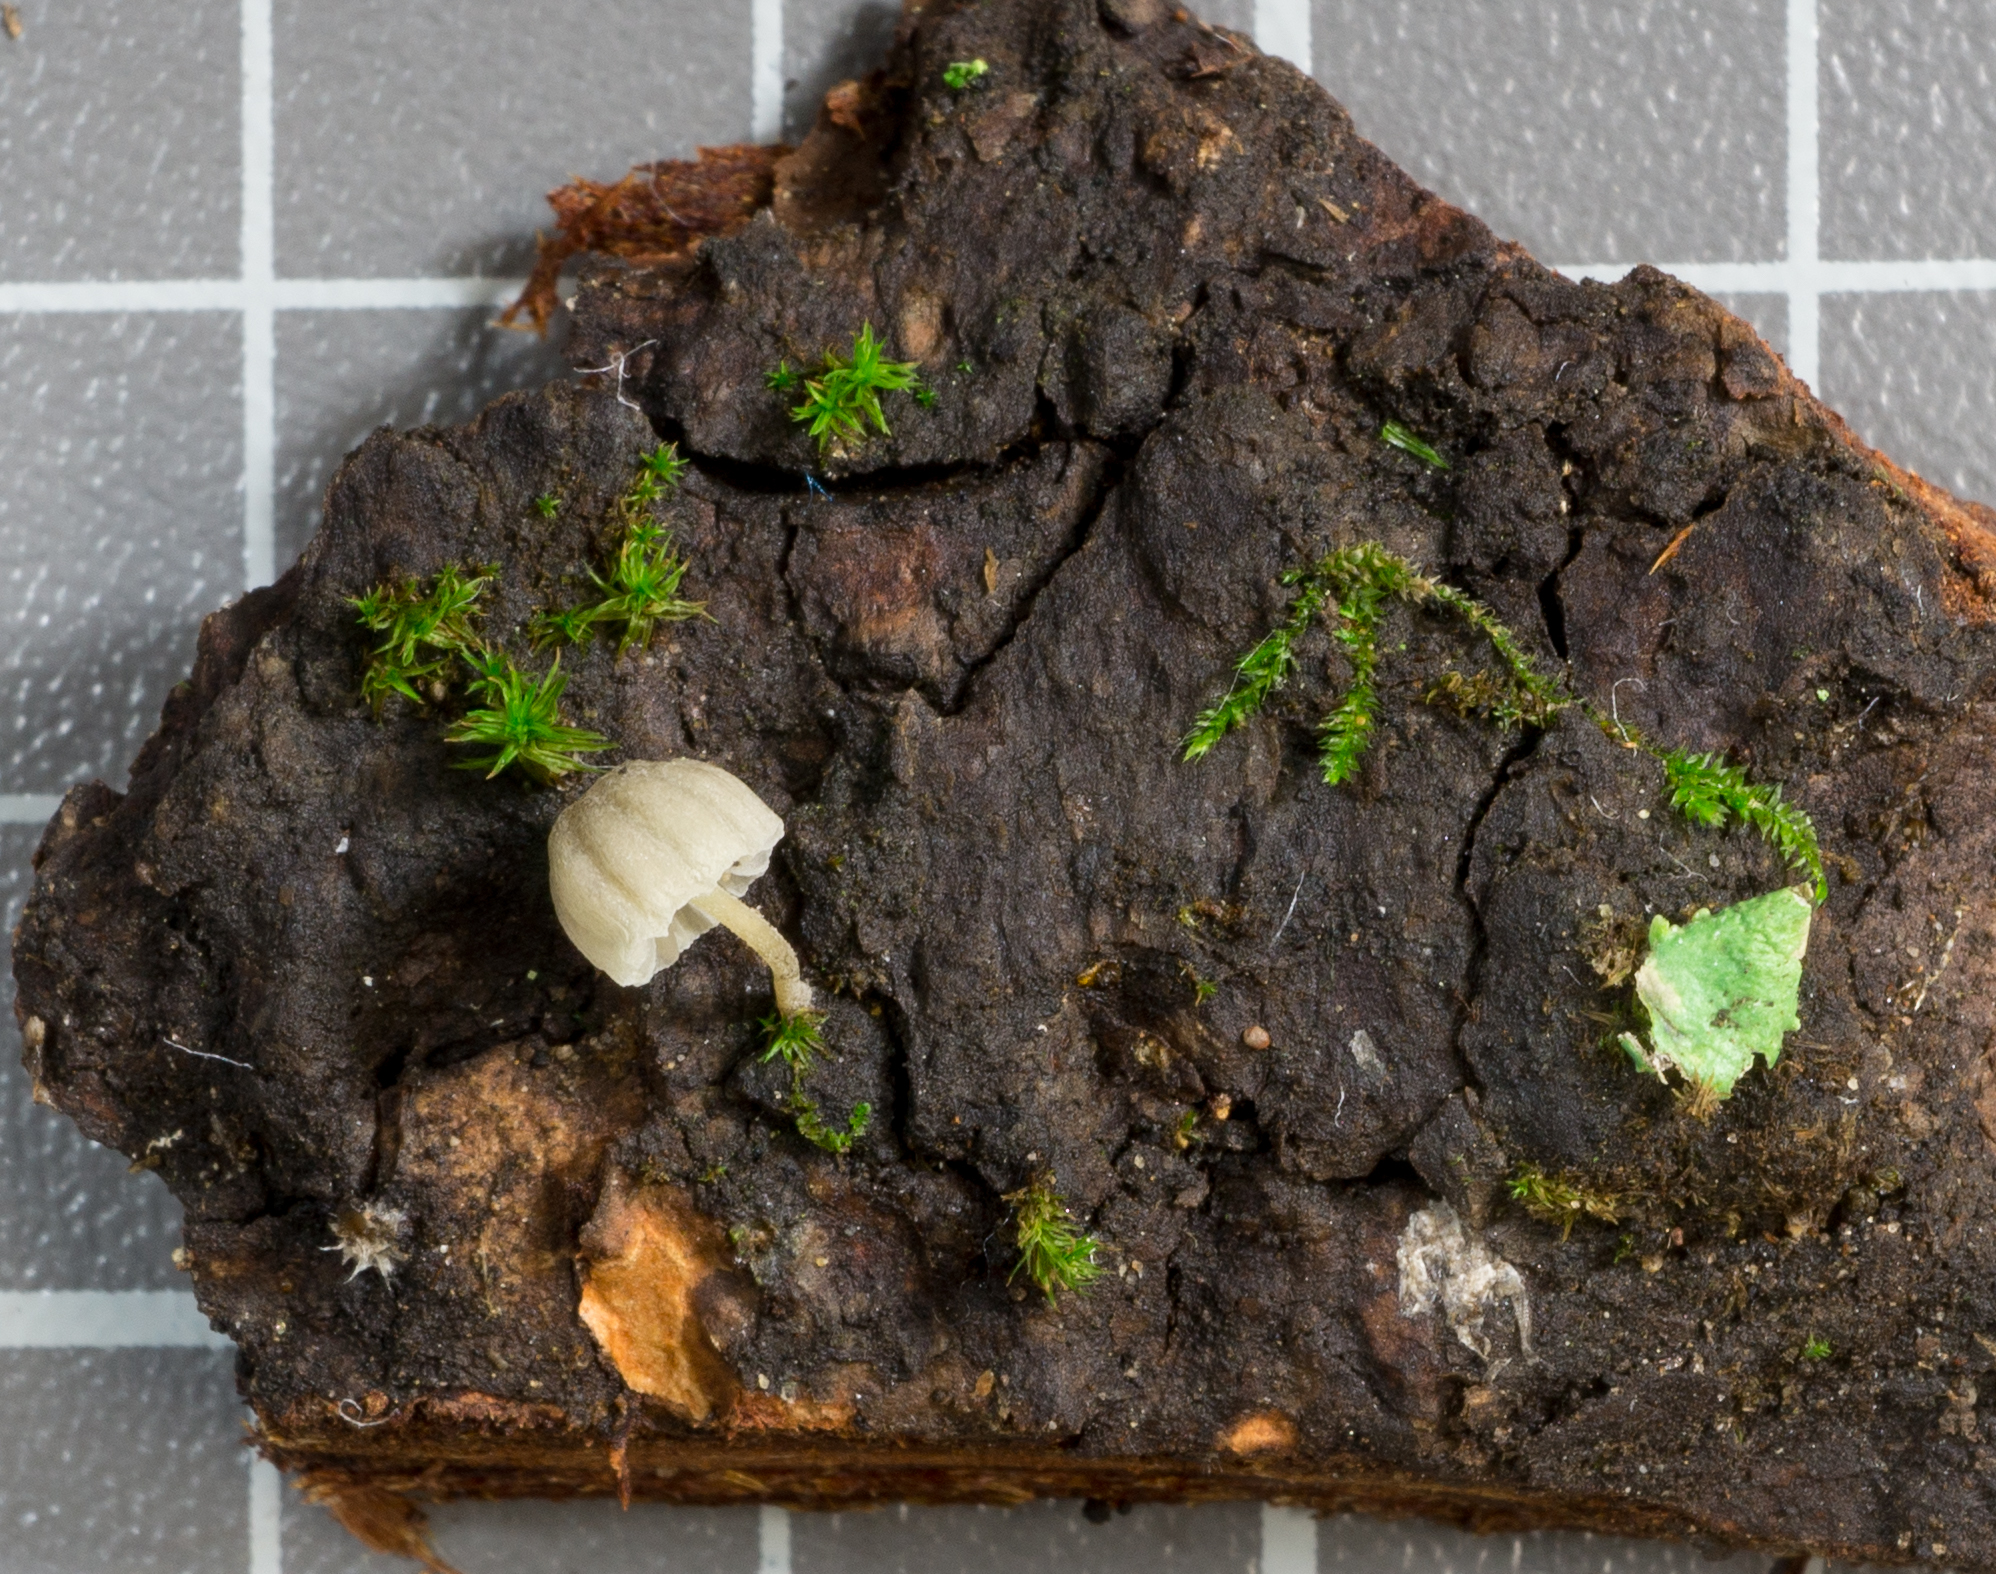 Mycena supina image